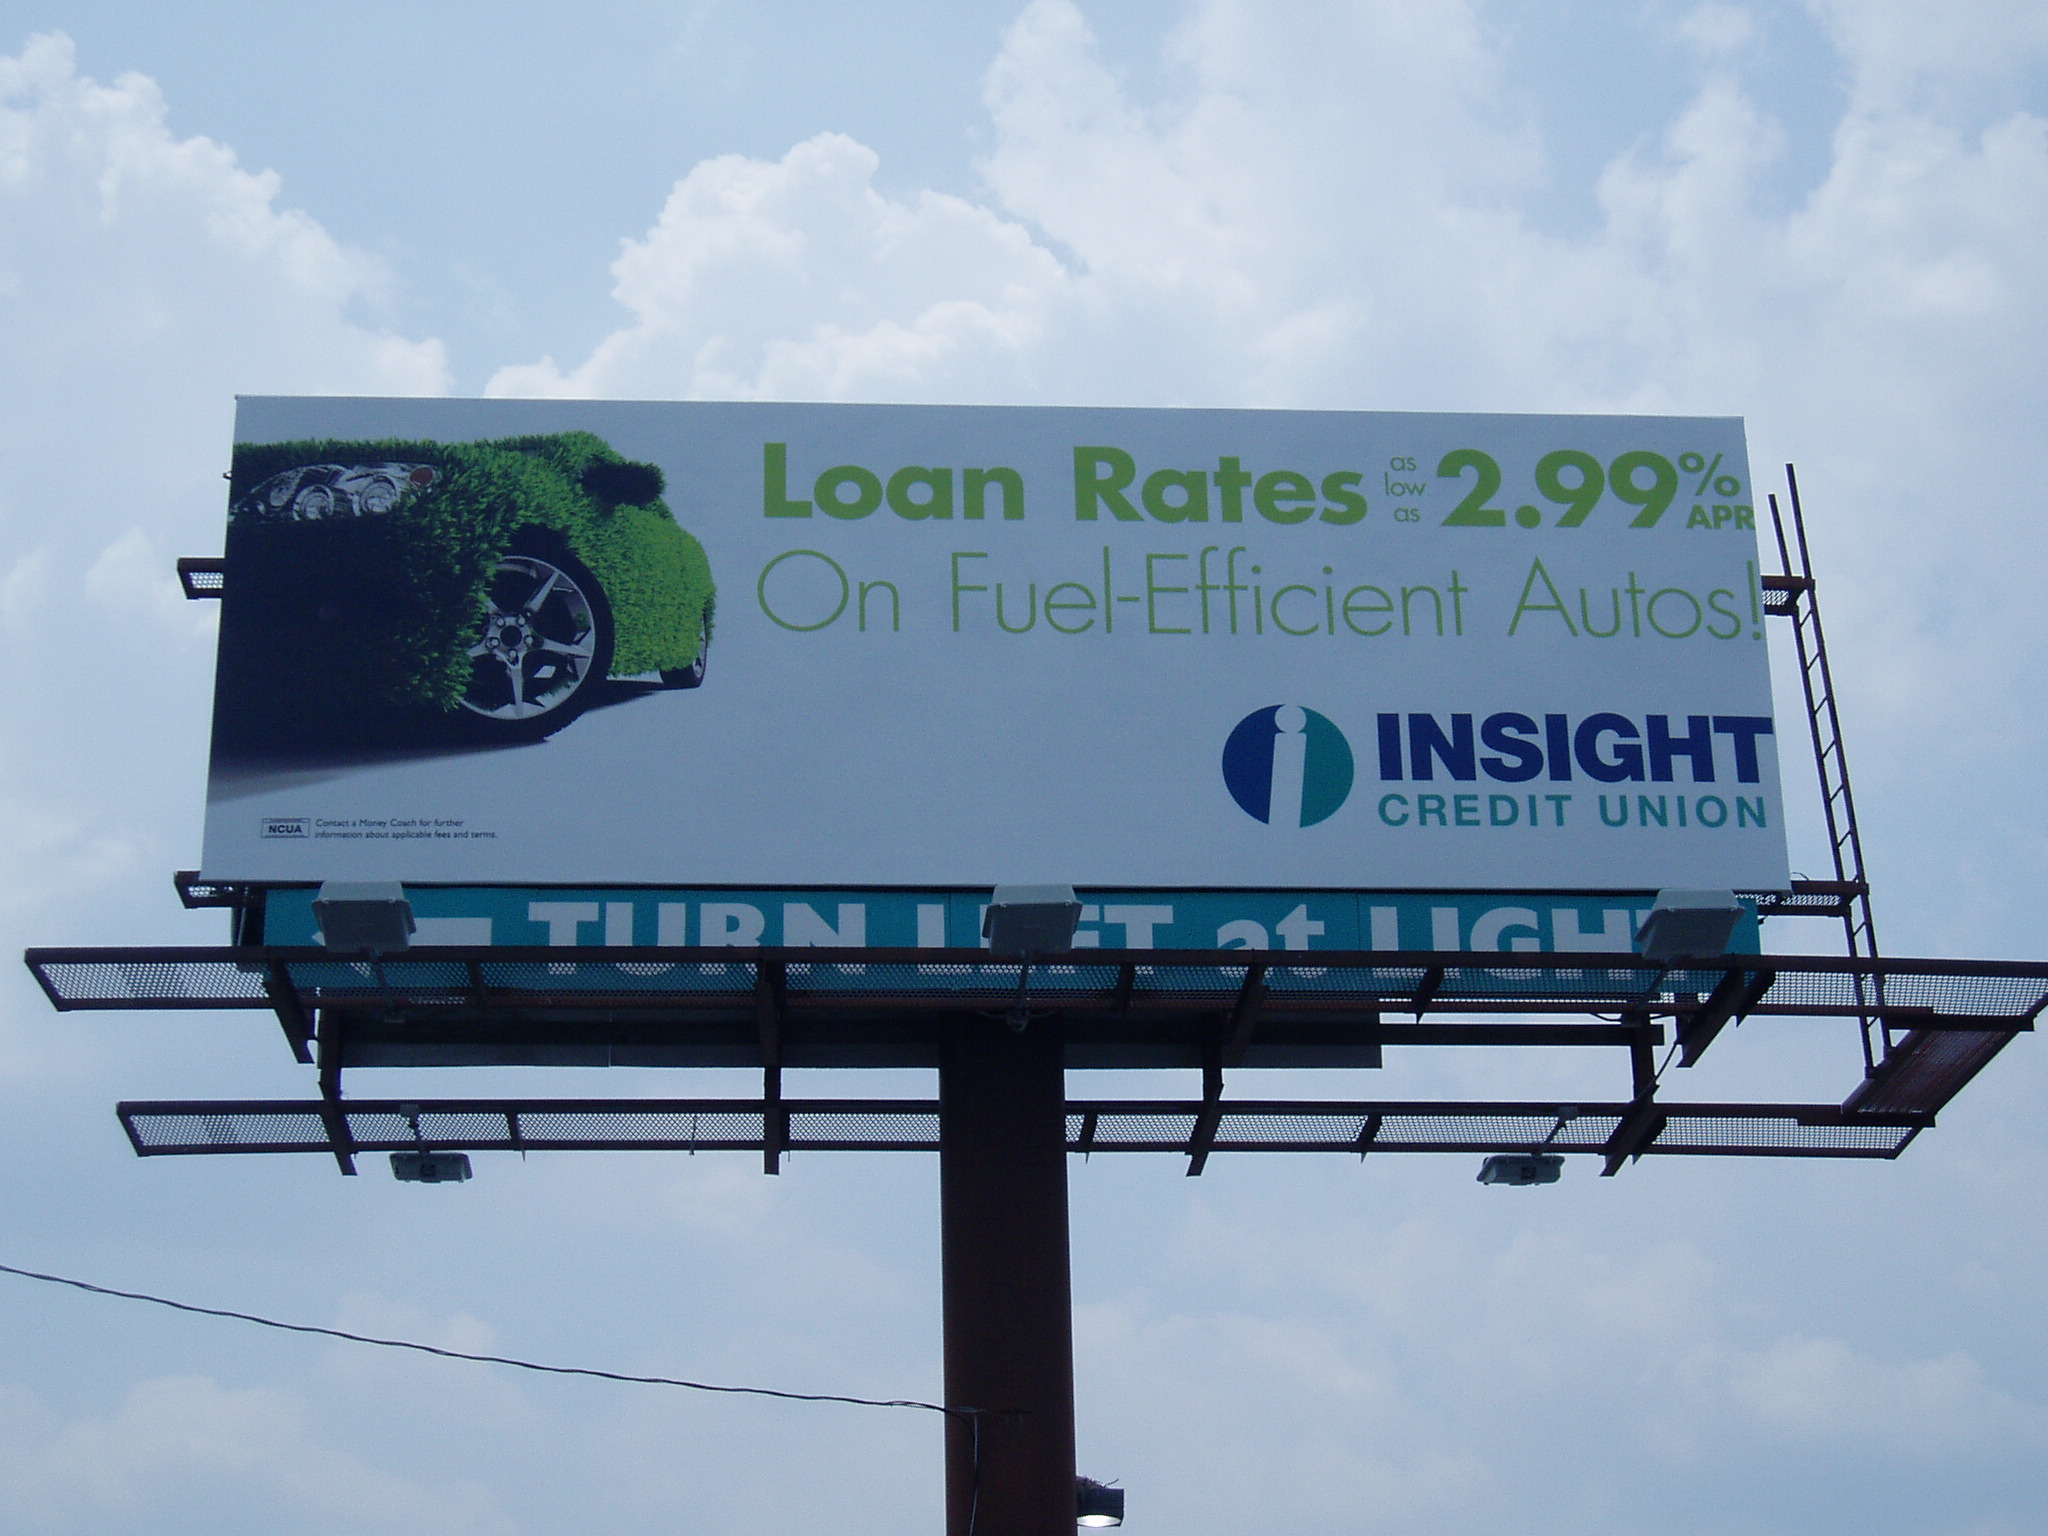 Insight_credit_union